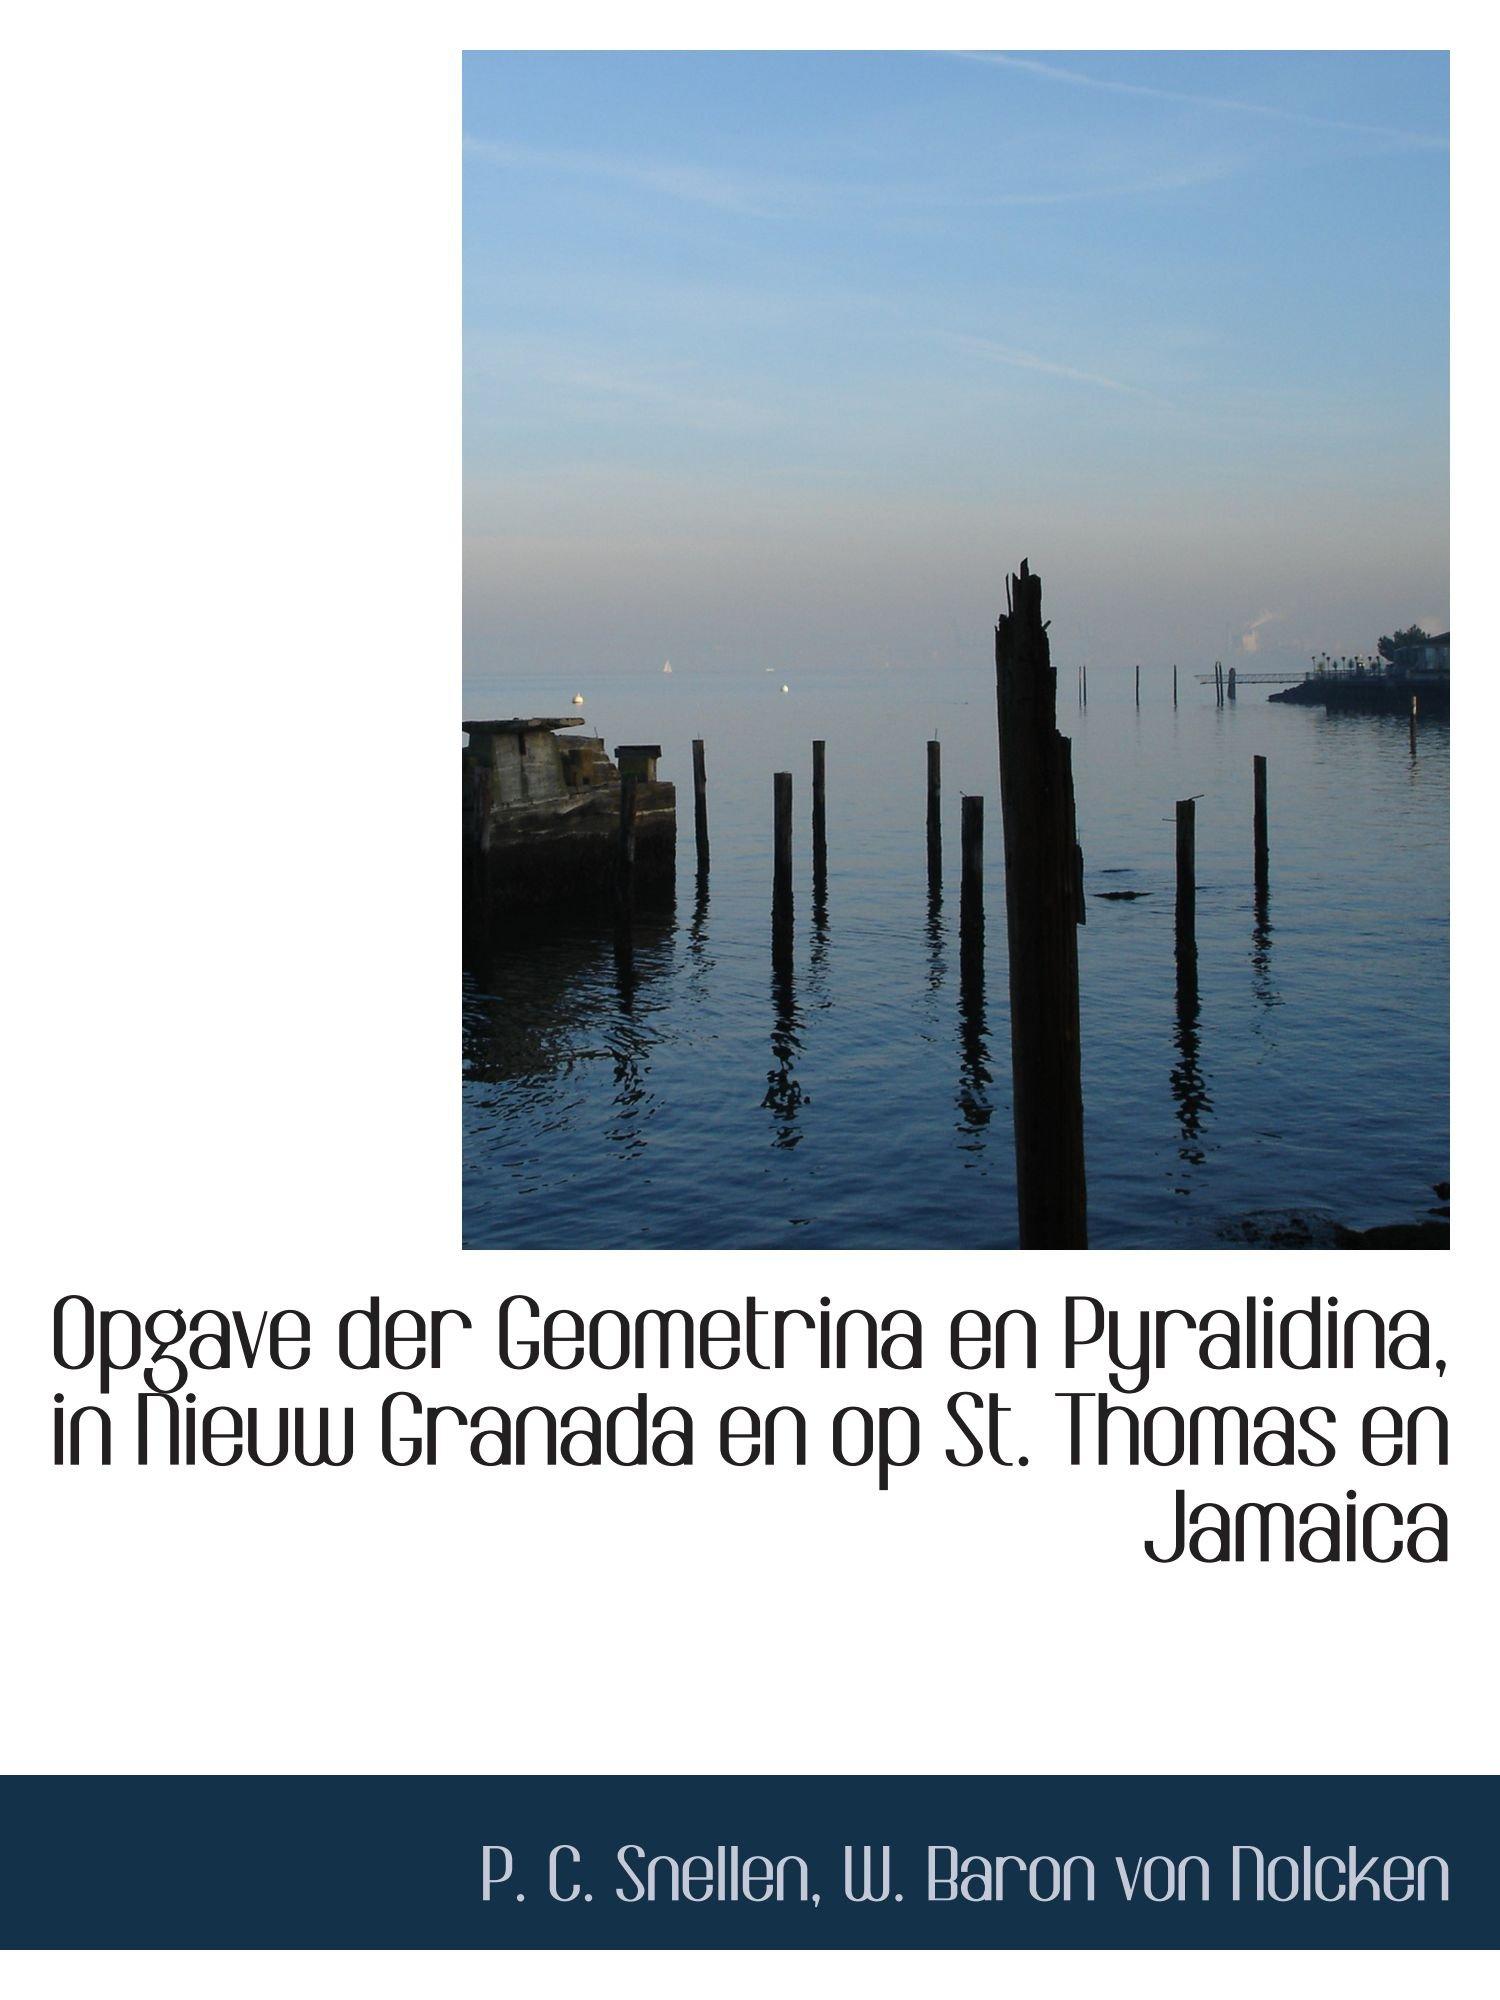 Opgave der Geometrina en Pyralidina, in Nieuw Granada en op St. Thomas en Jamaica (Dutch Edition)